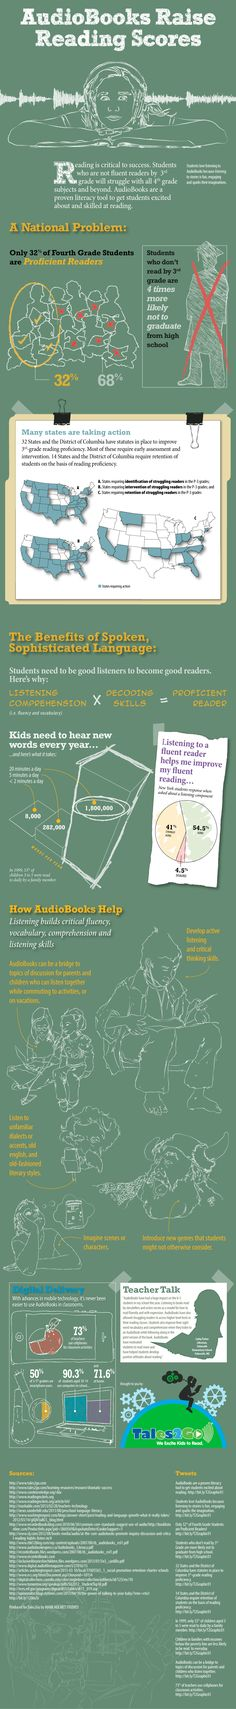 AudioBooks Raise Reading Scores Infographic | Tales2Go